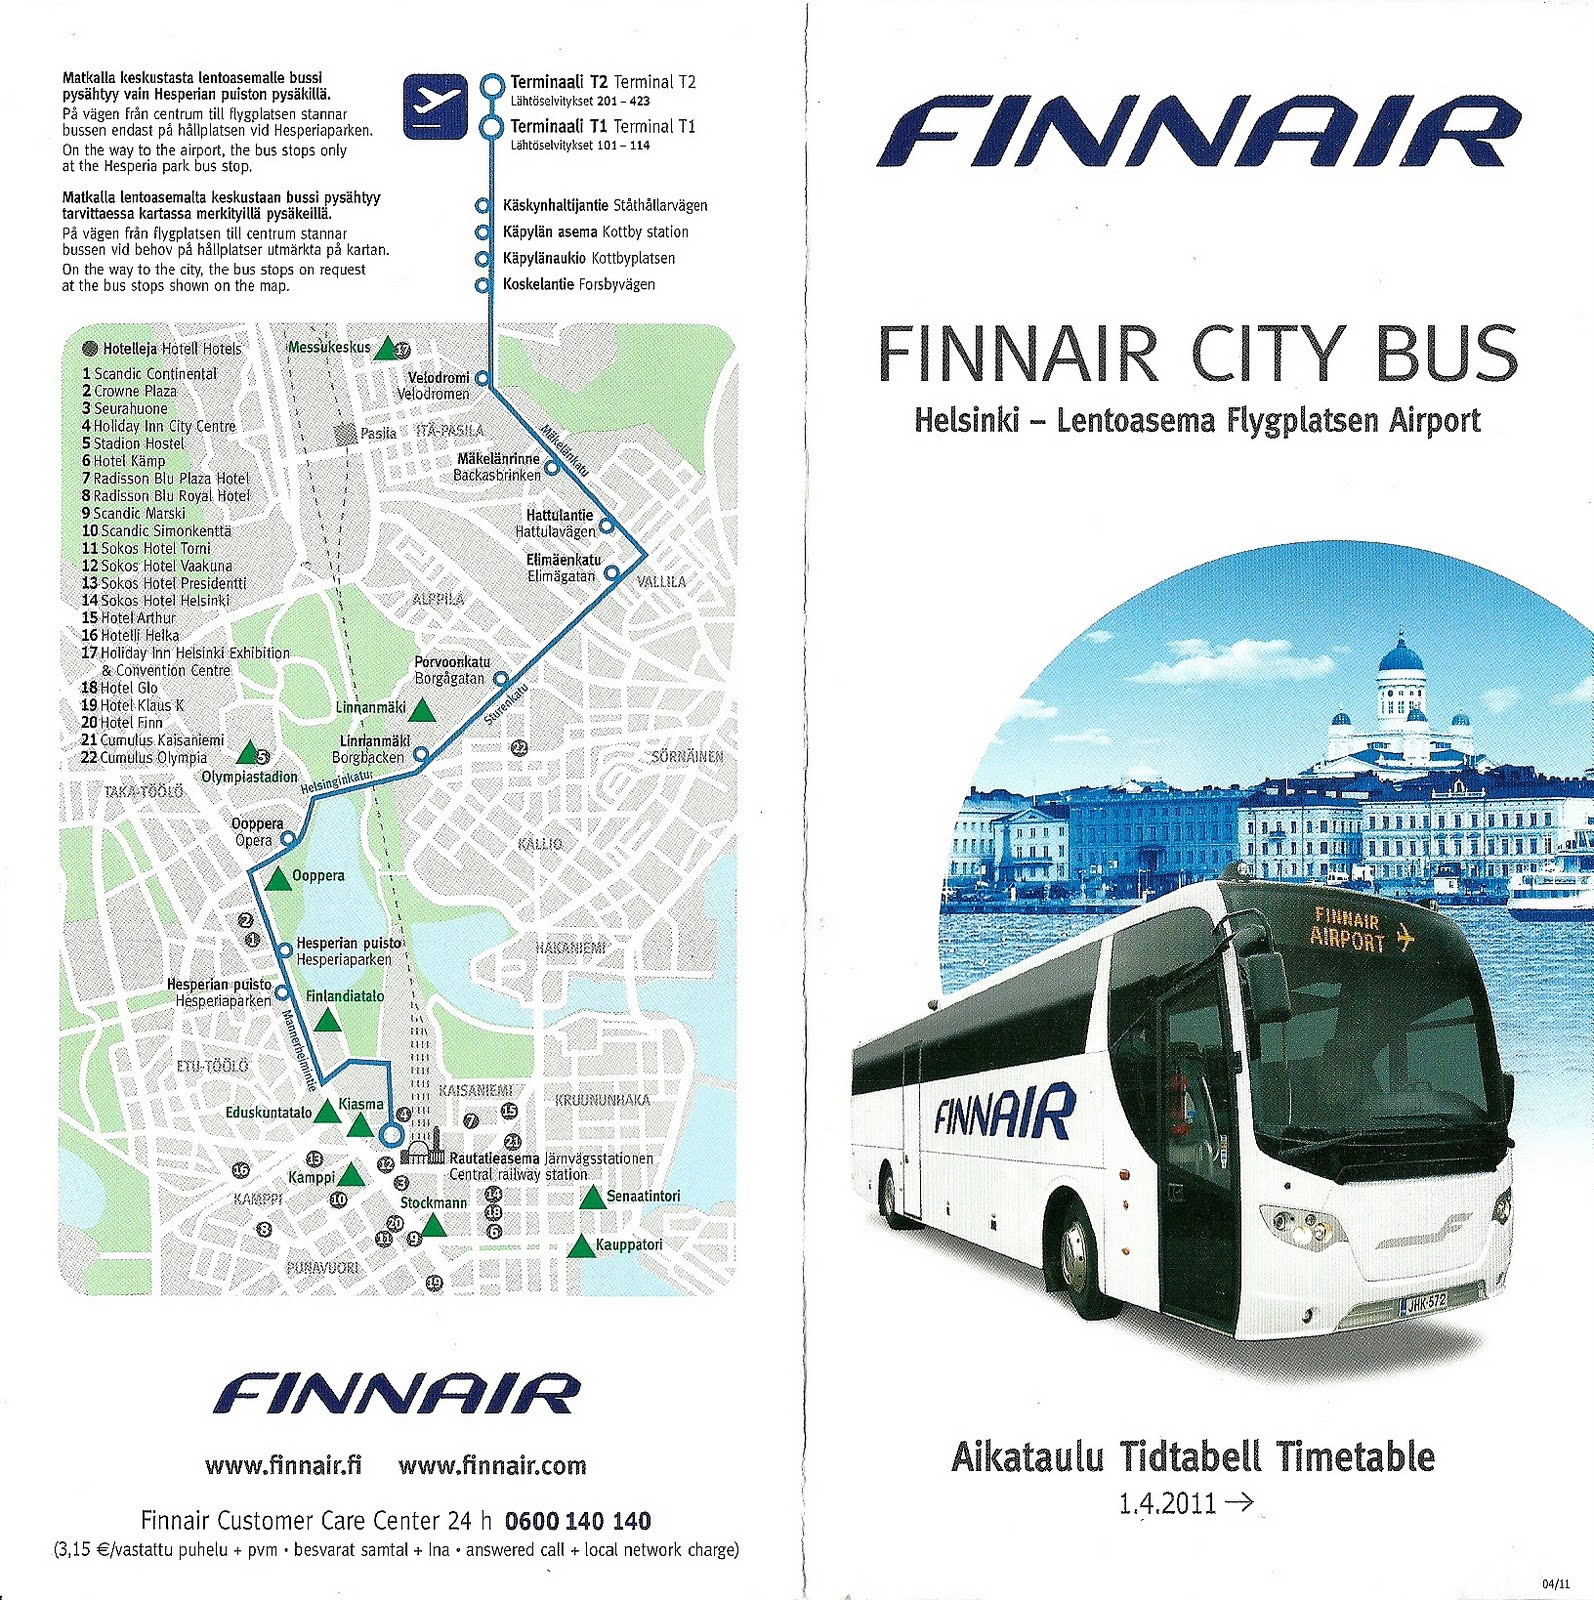 Finnair Bussi Aikataulu